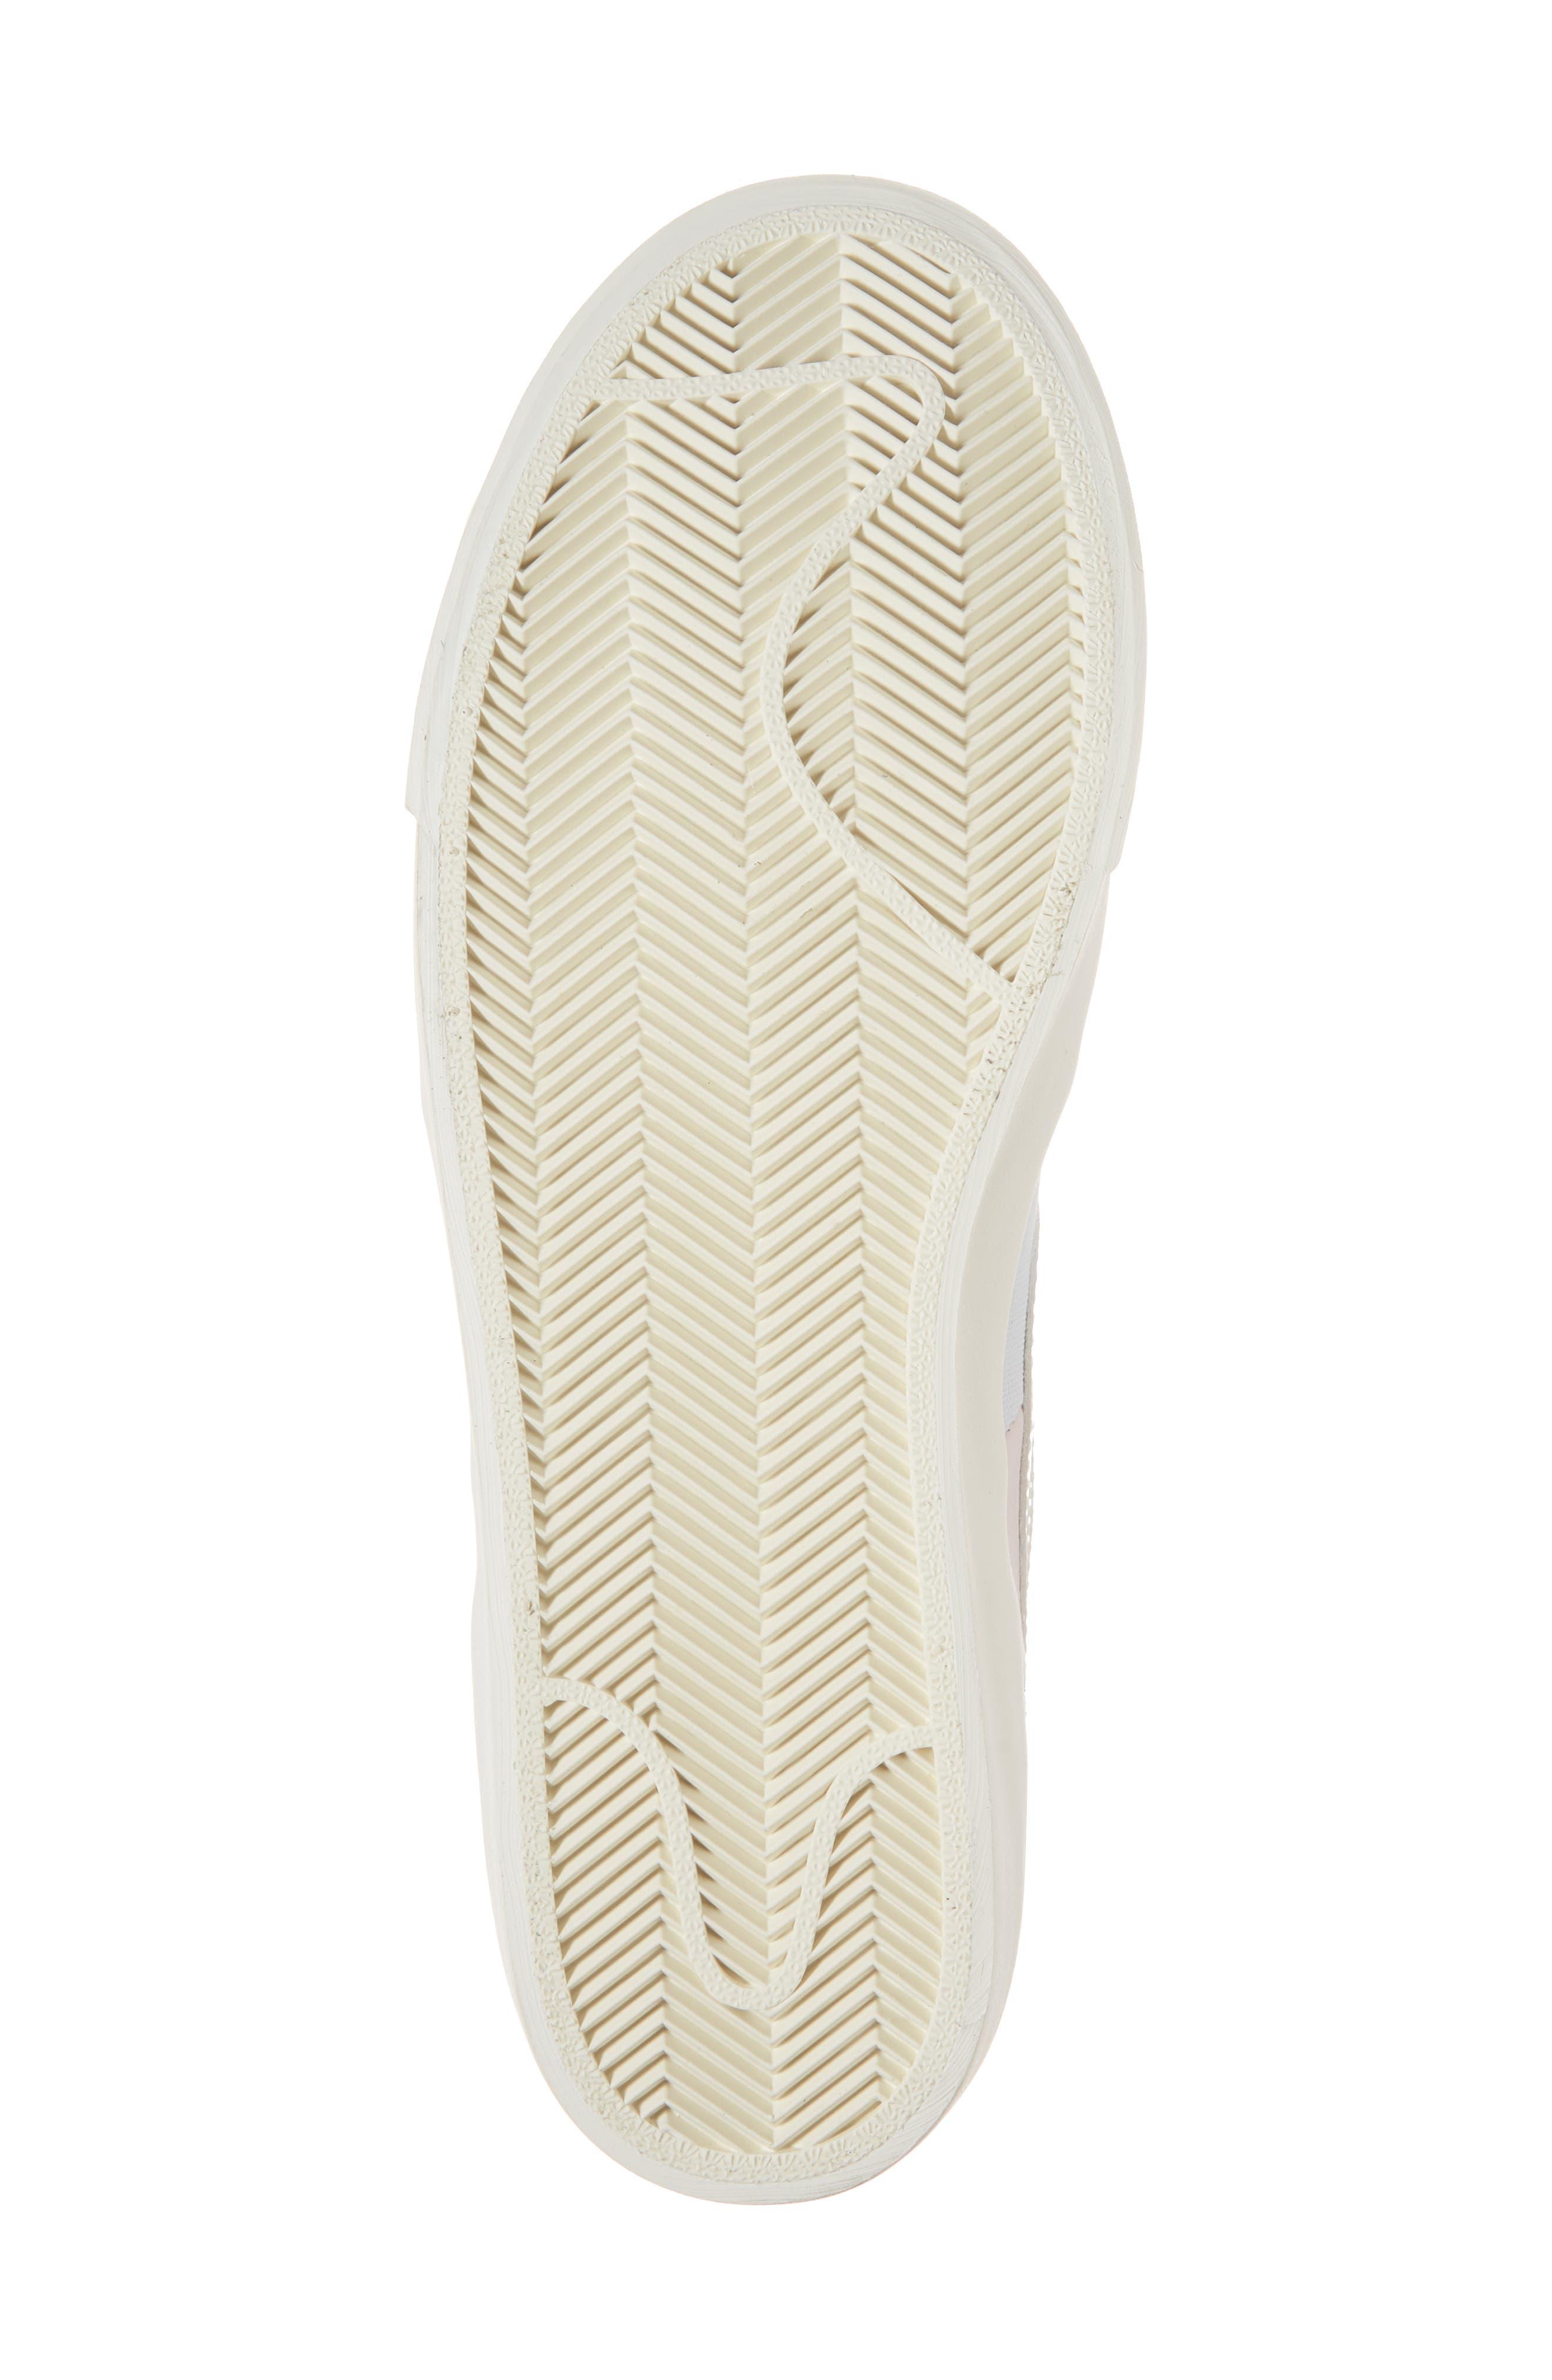 Blazer Royal Easter QS High Top Sneaker,                             Alternate thumbnail 6, color,                             Arctic Pink/ Sail-Blue-Blue